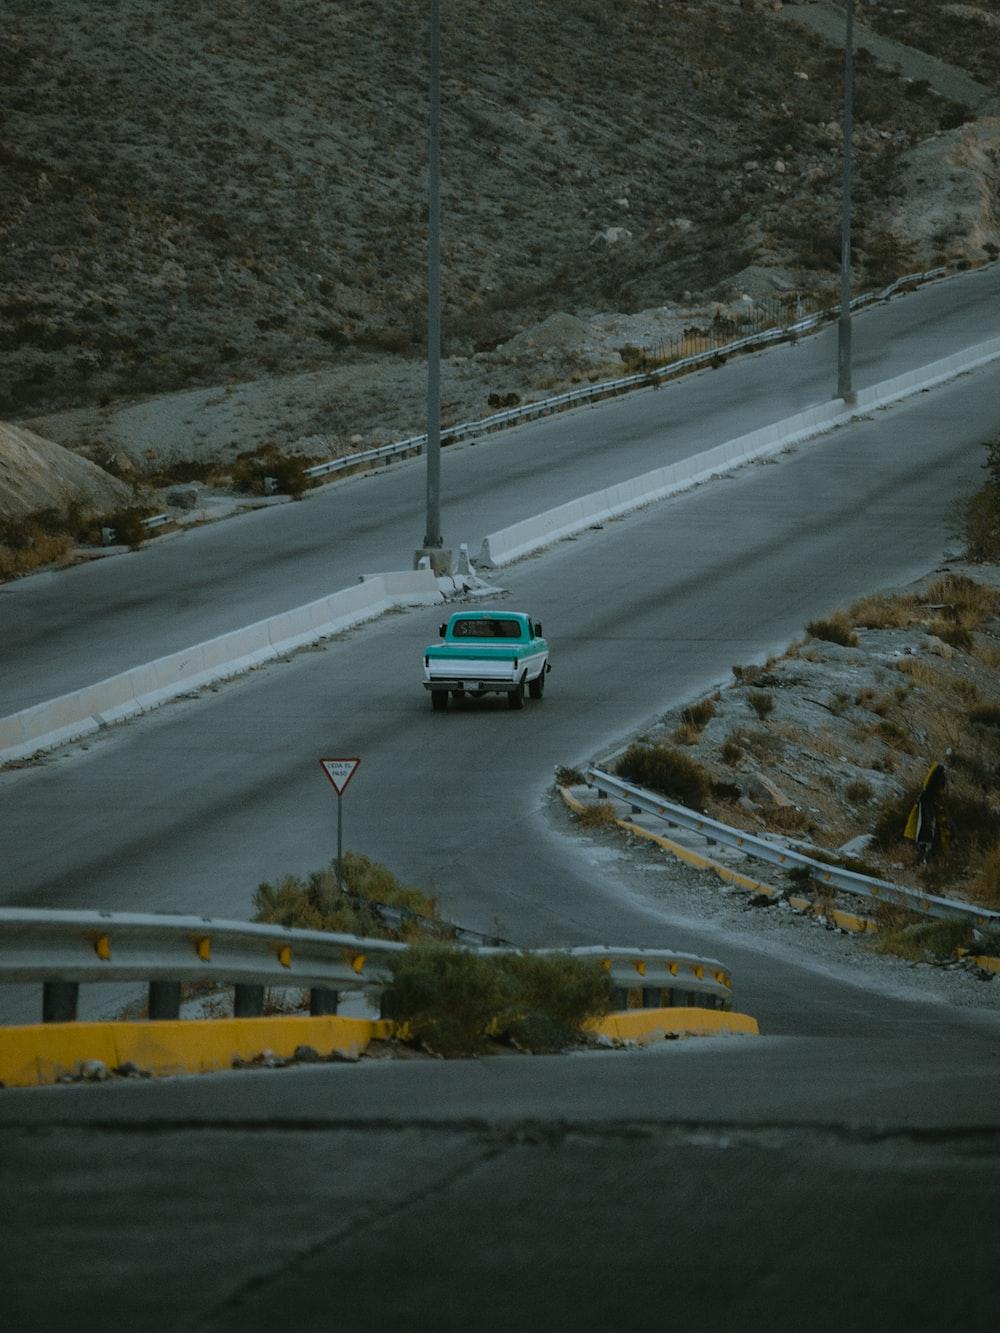 pickup truck on road